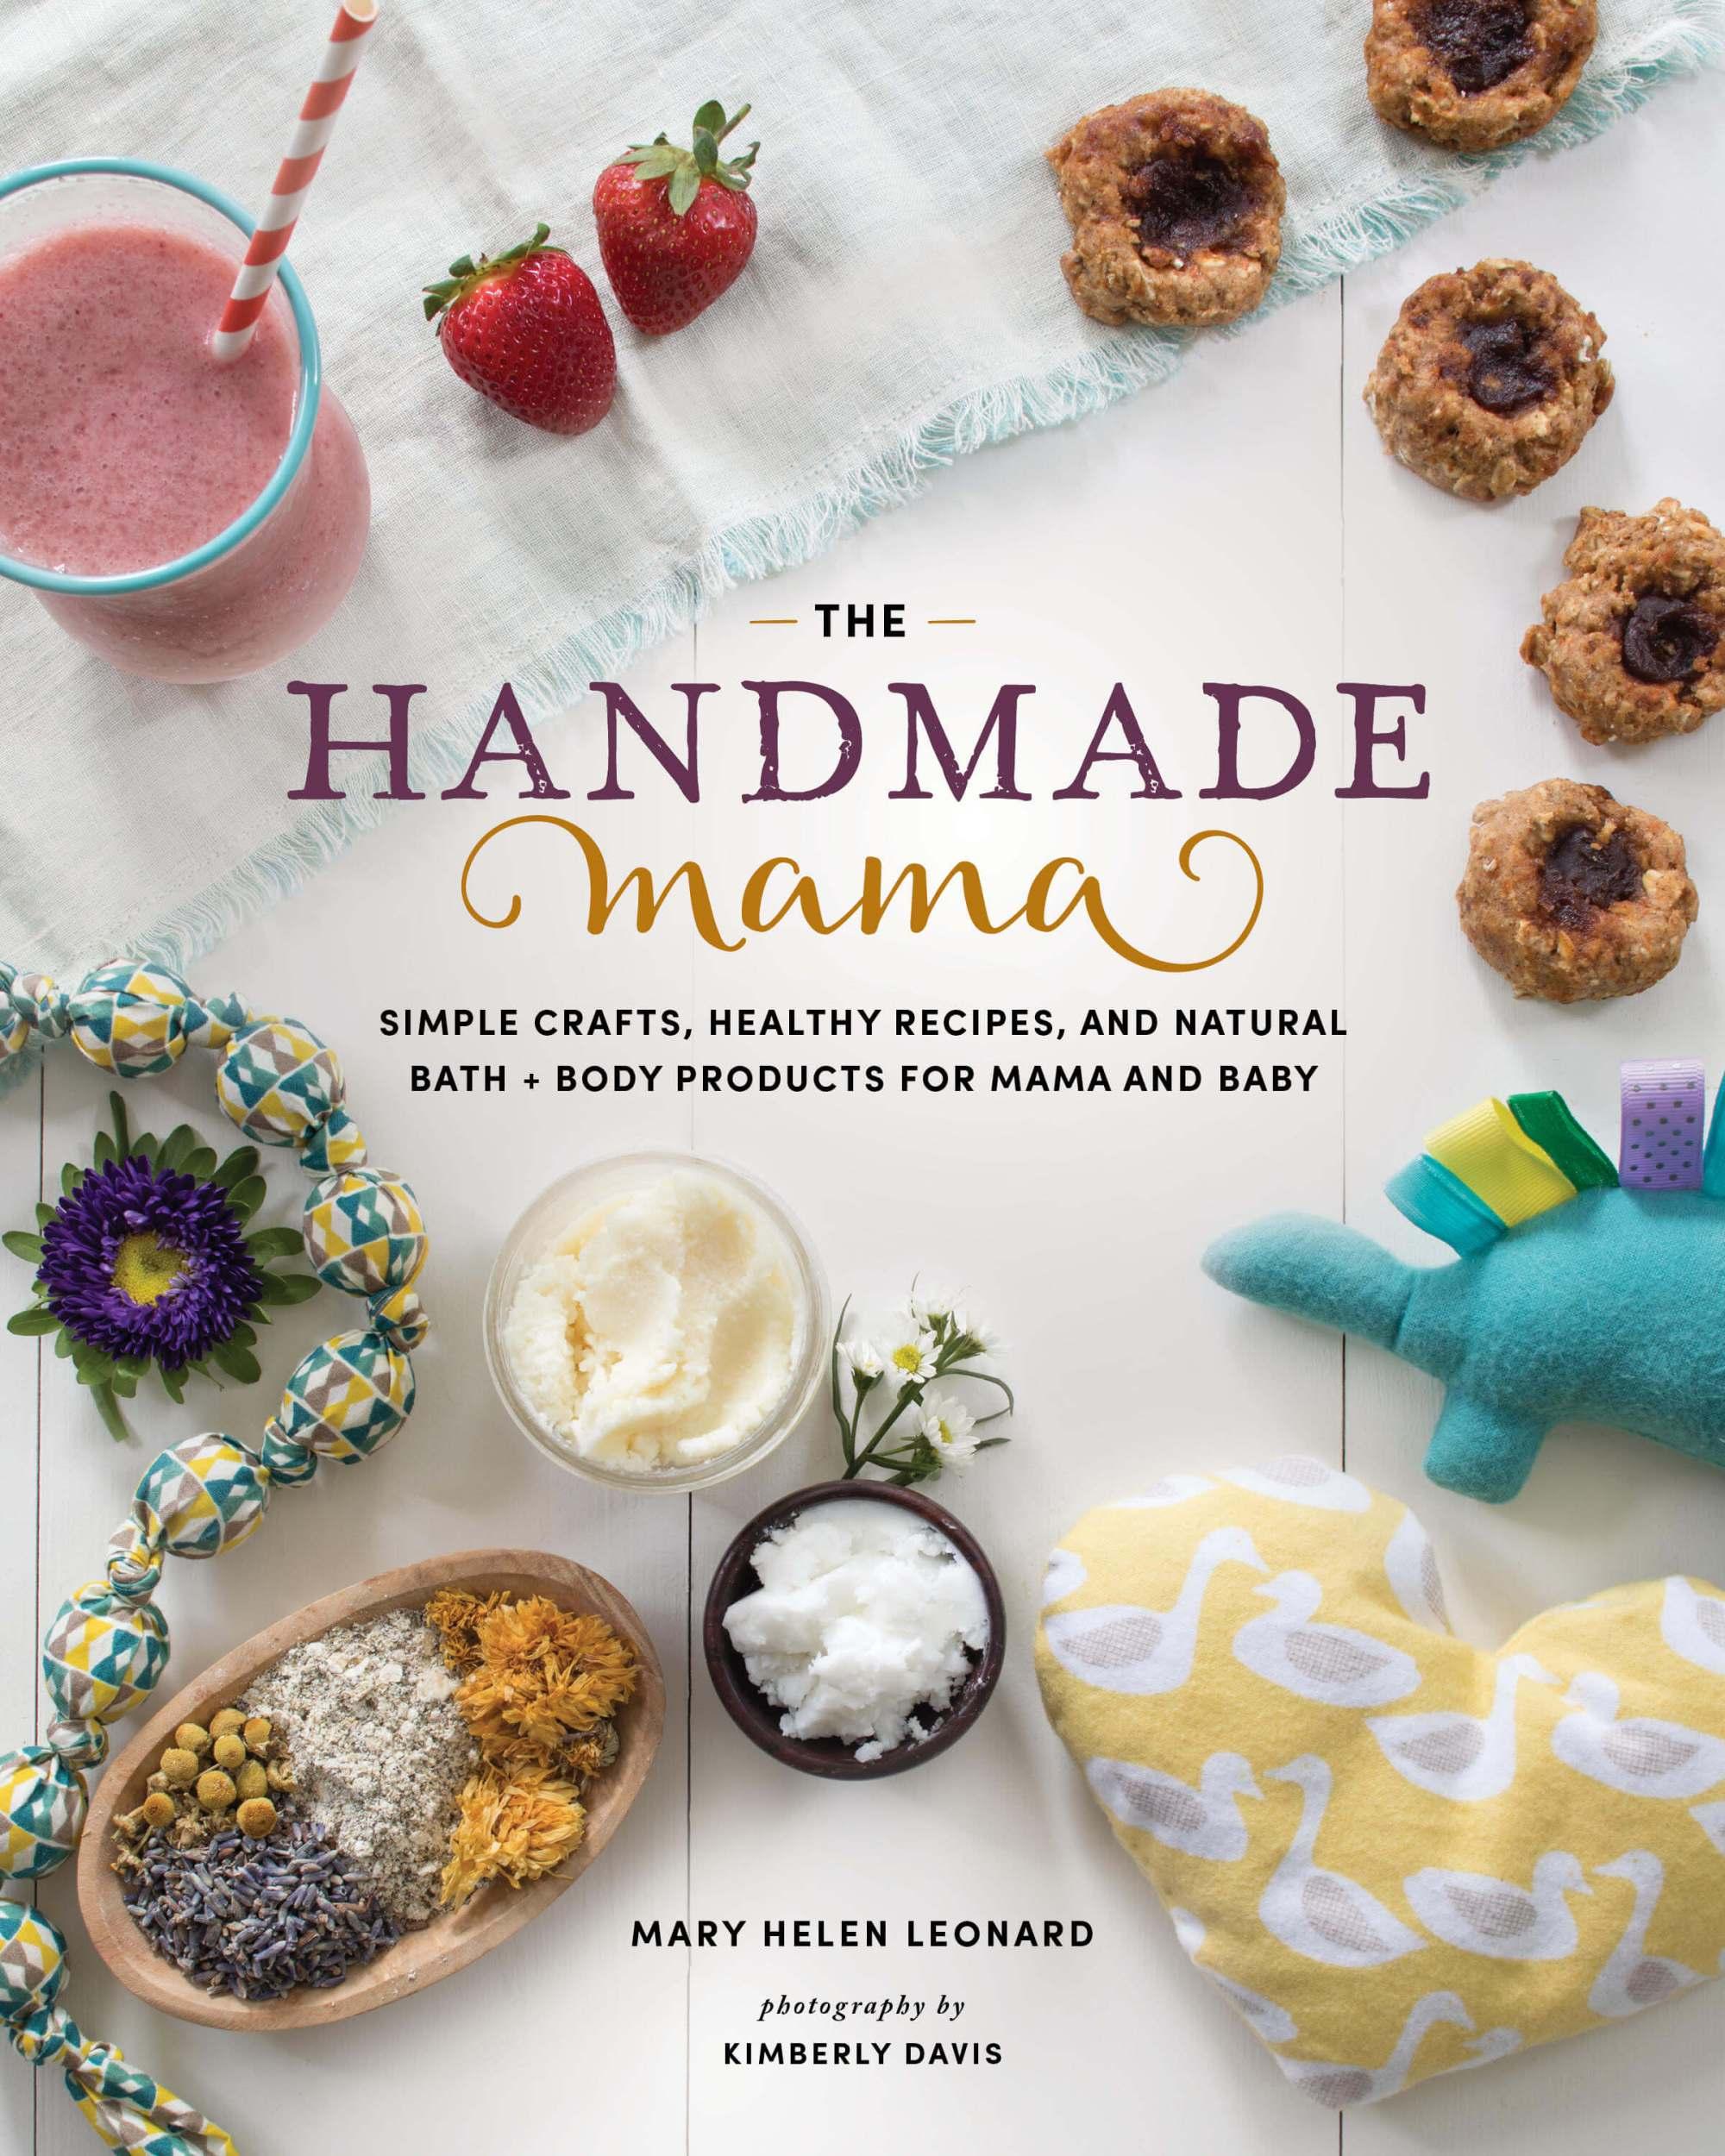 The Handmade Mama - Styling by Mary Helen Leonard | Photography by Kimberly Davis | Spring House Press 2018